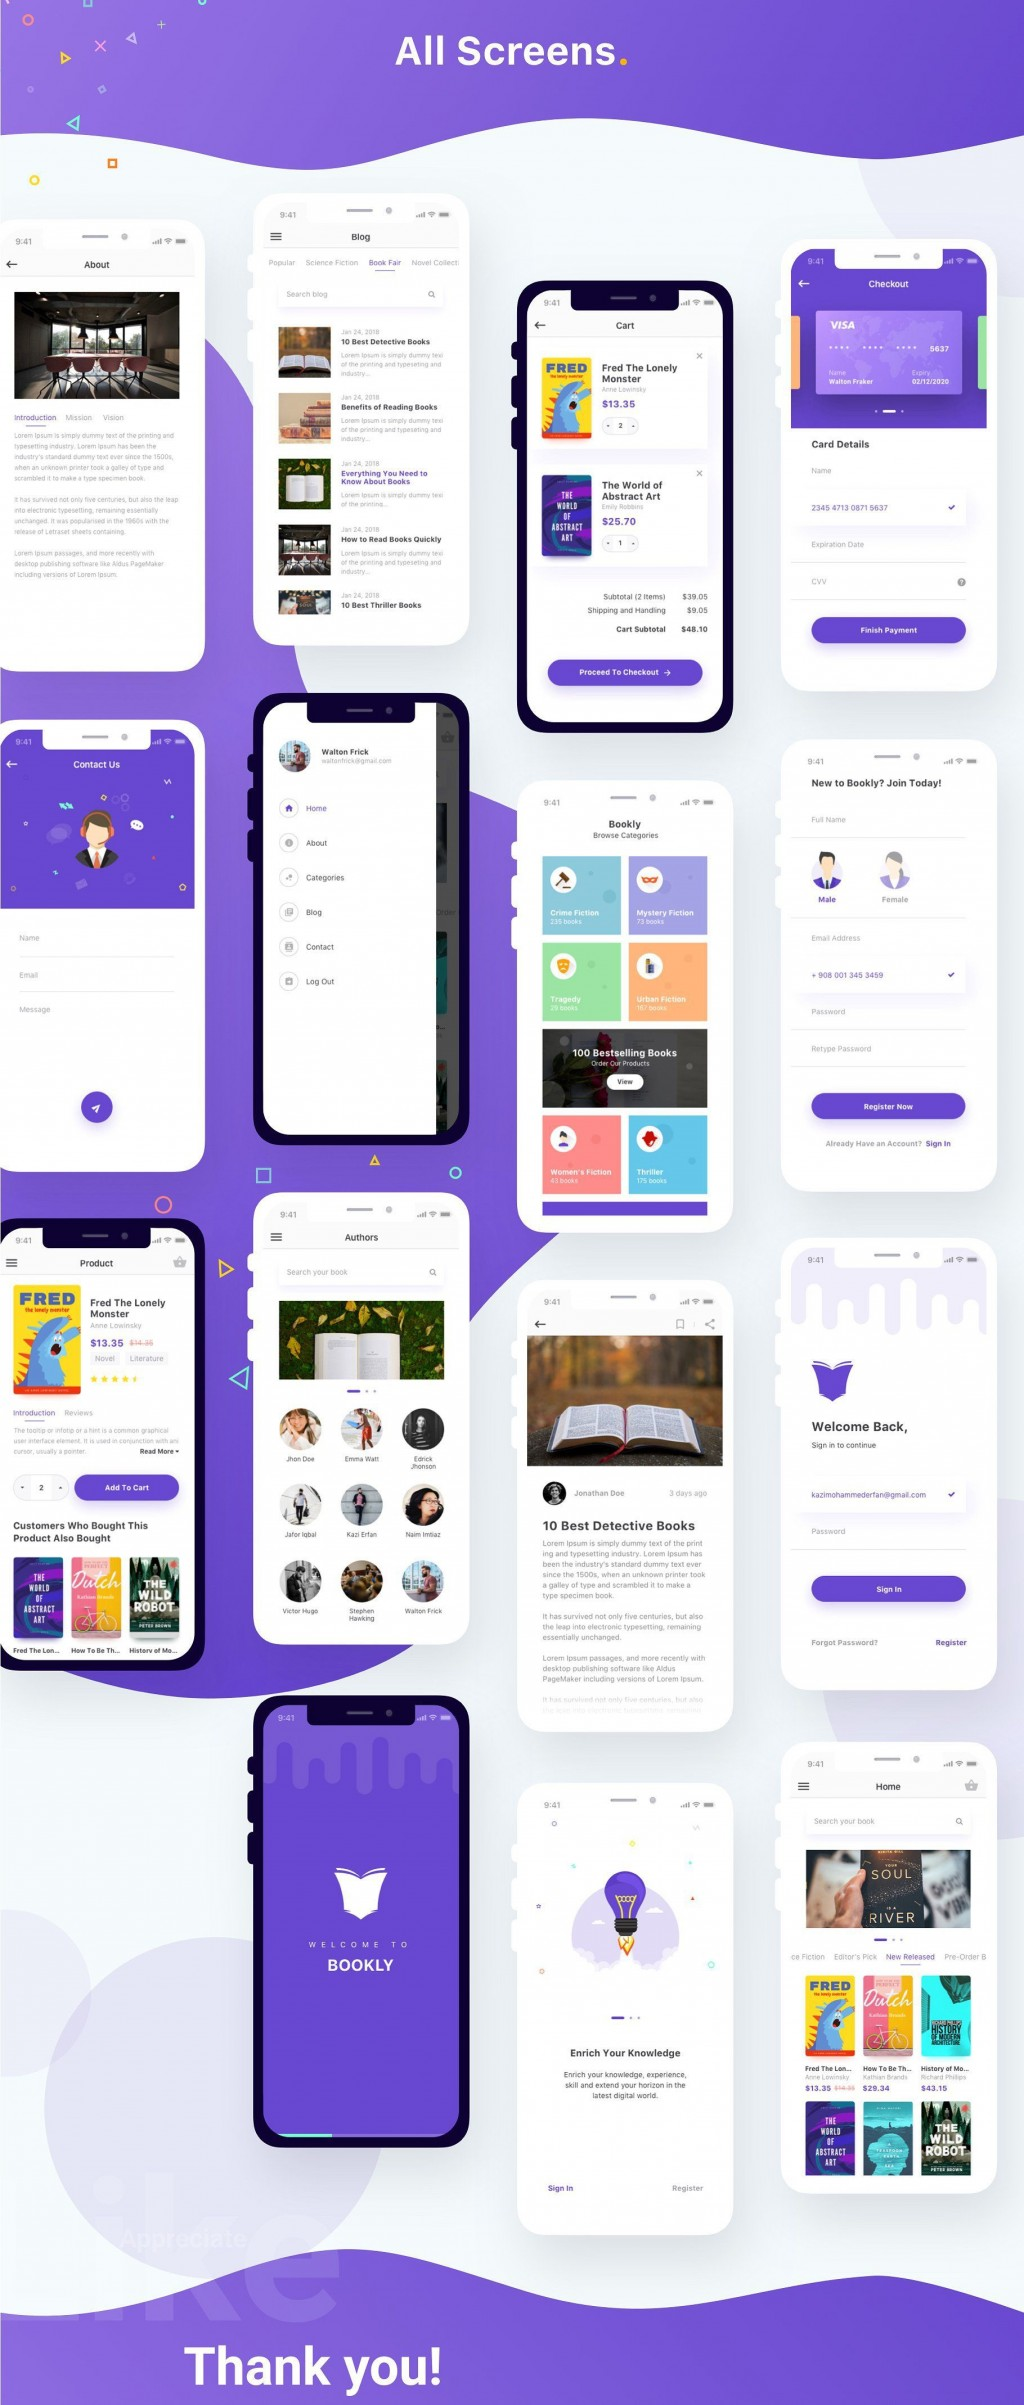 001 Fantastic Iphone App Design Template High Def  Templates Io Sketch Psd Free DownloadLarge